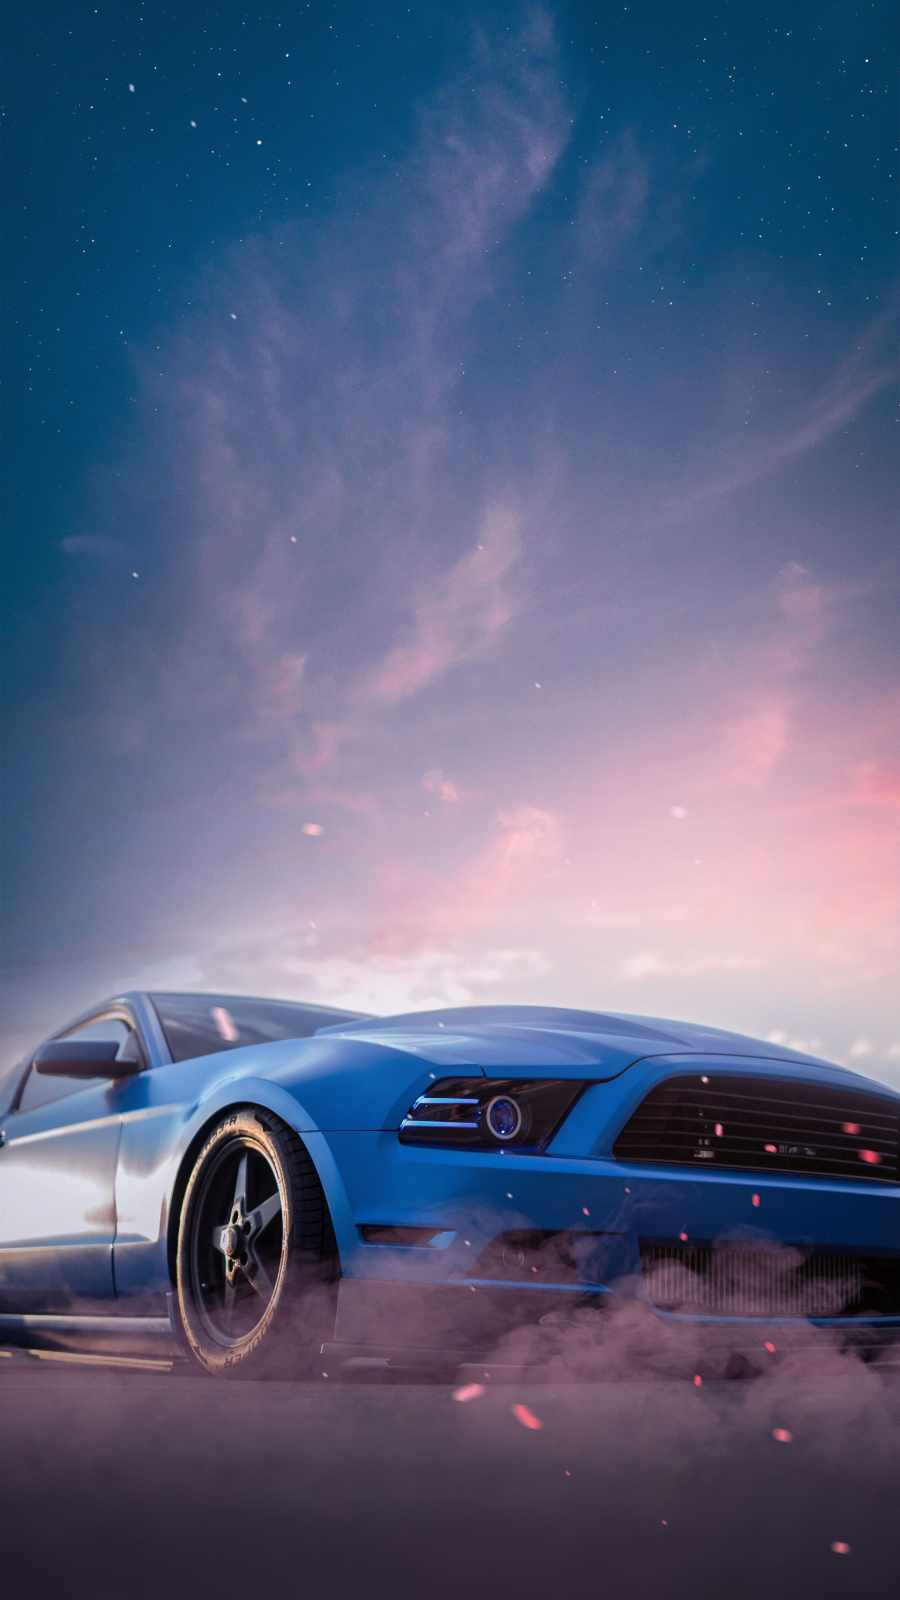 Blue Mustang iPhone Wallpaper